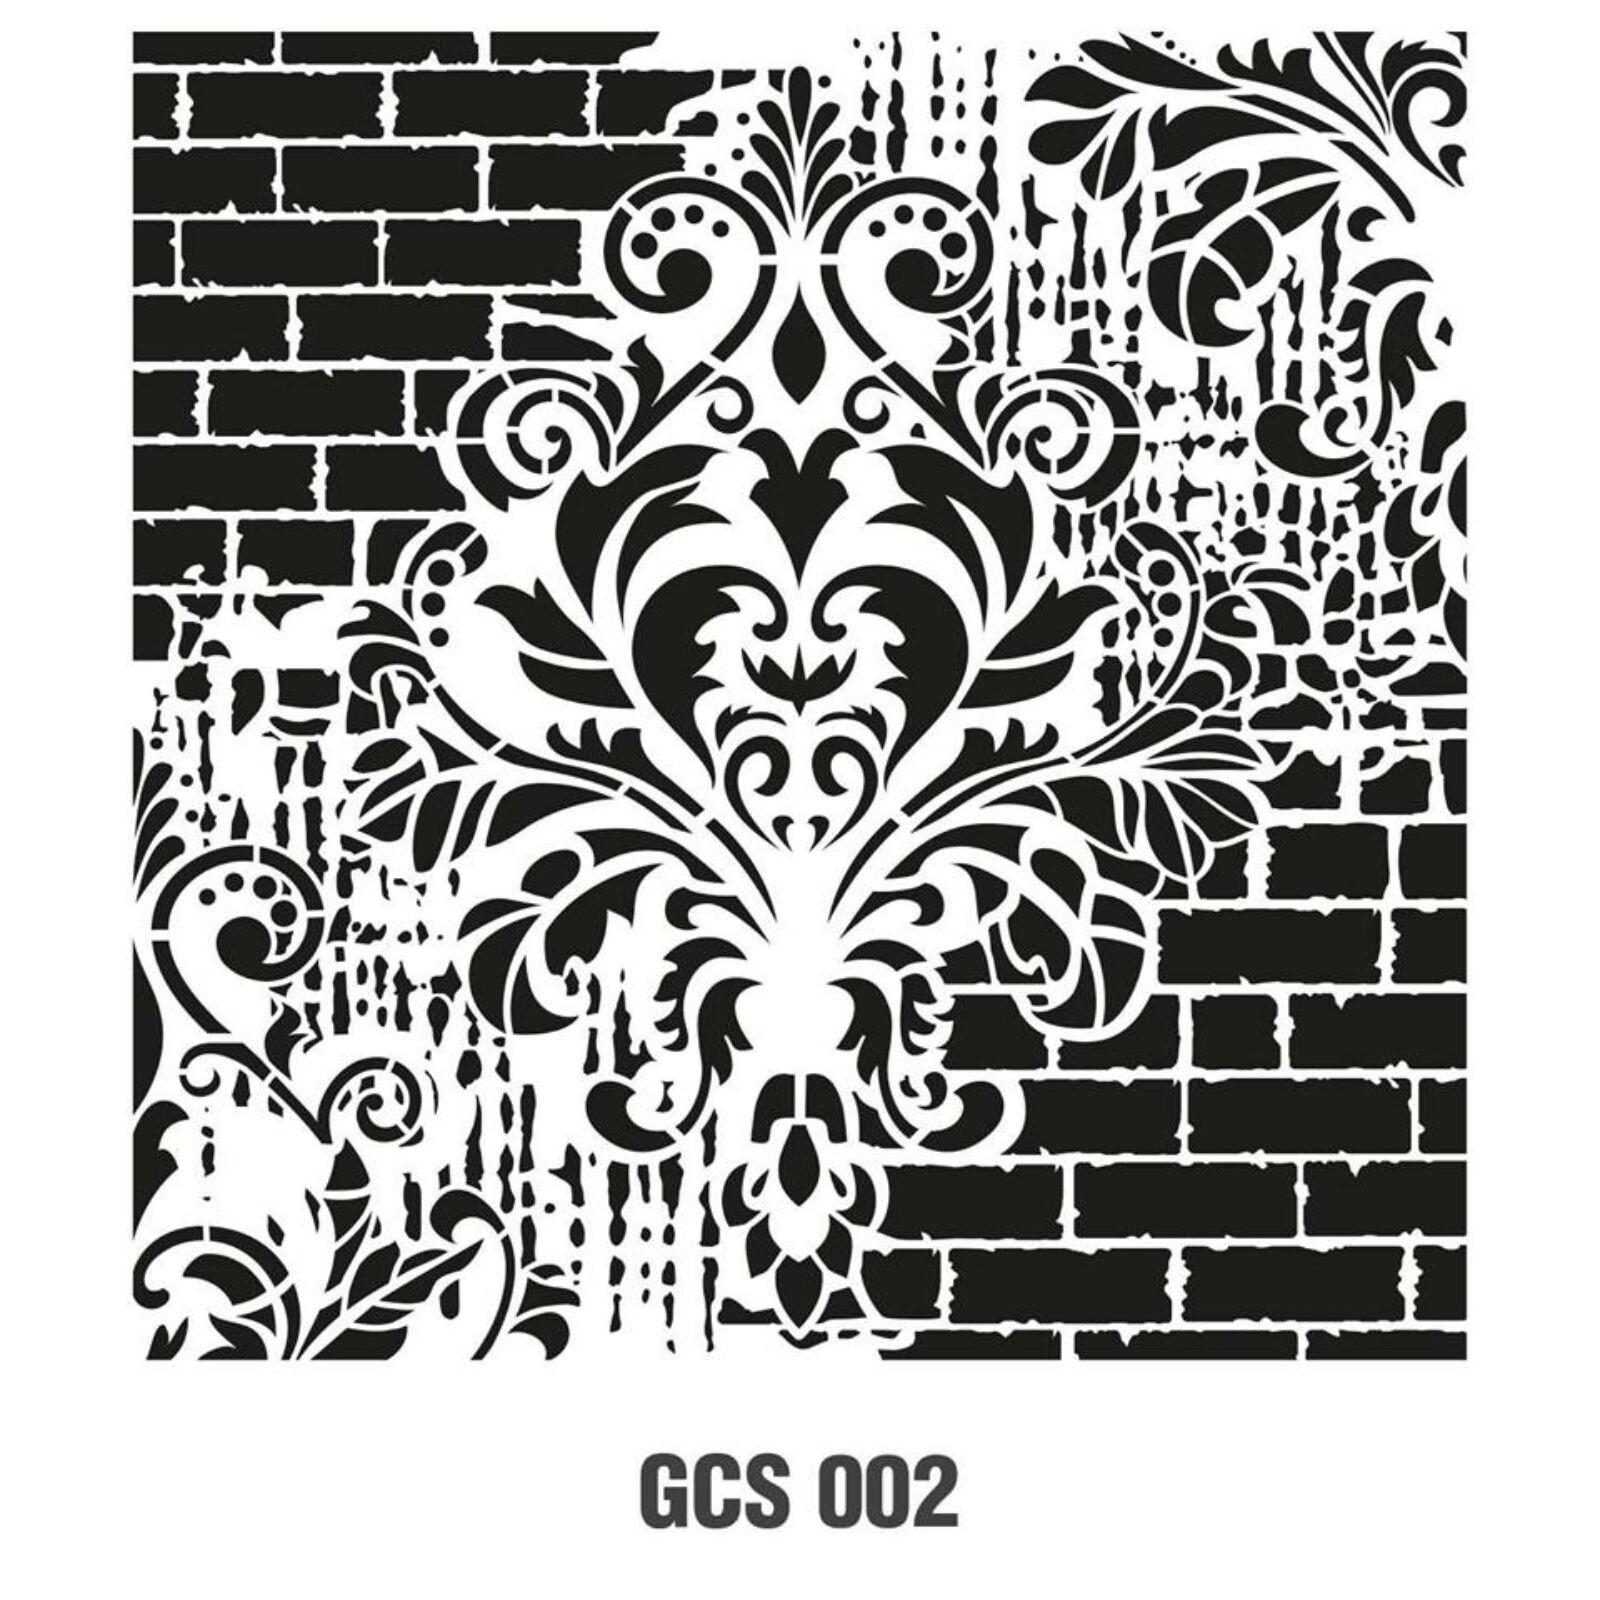 GCS002 stencil